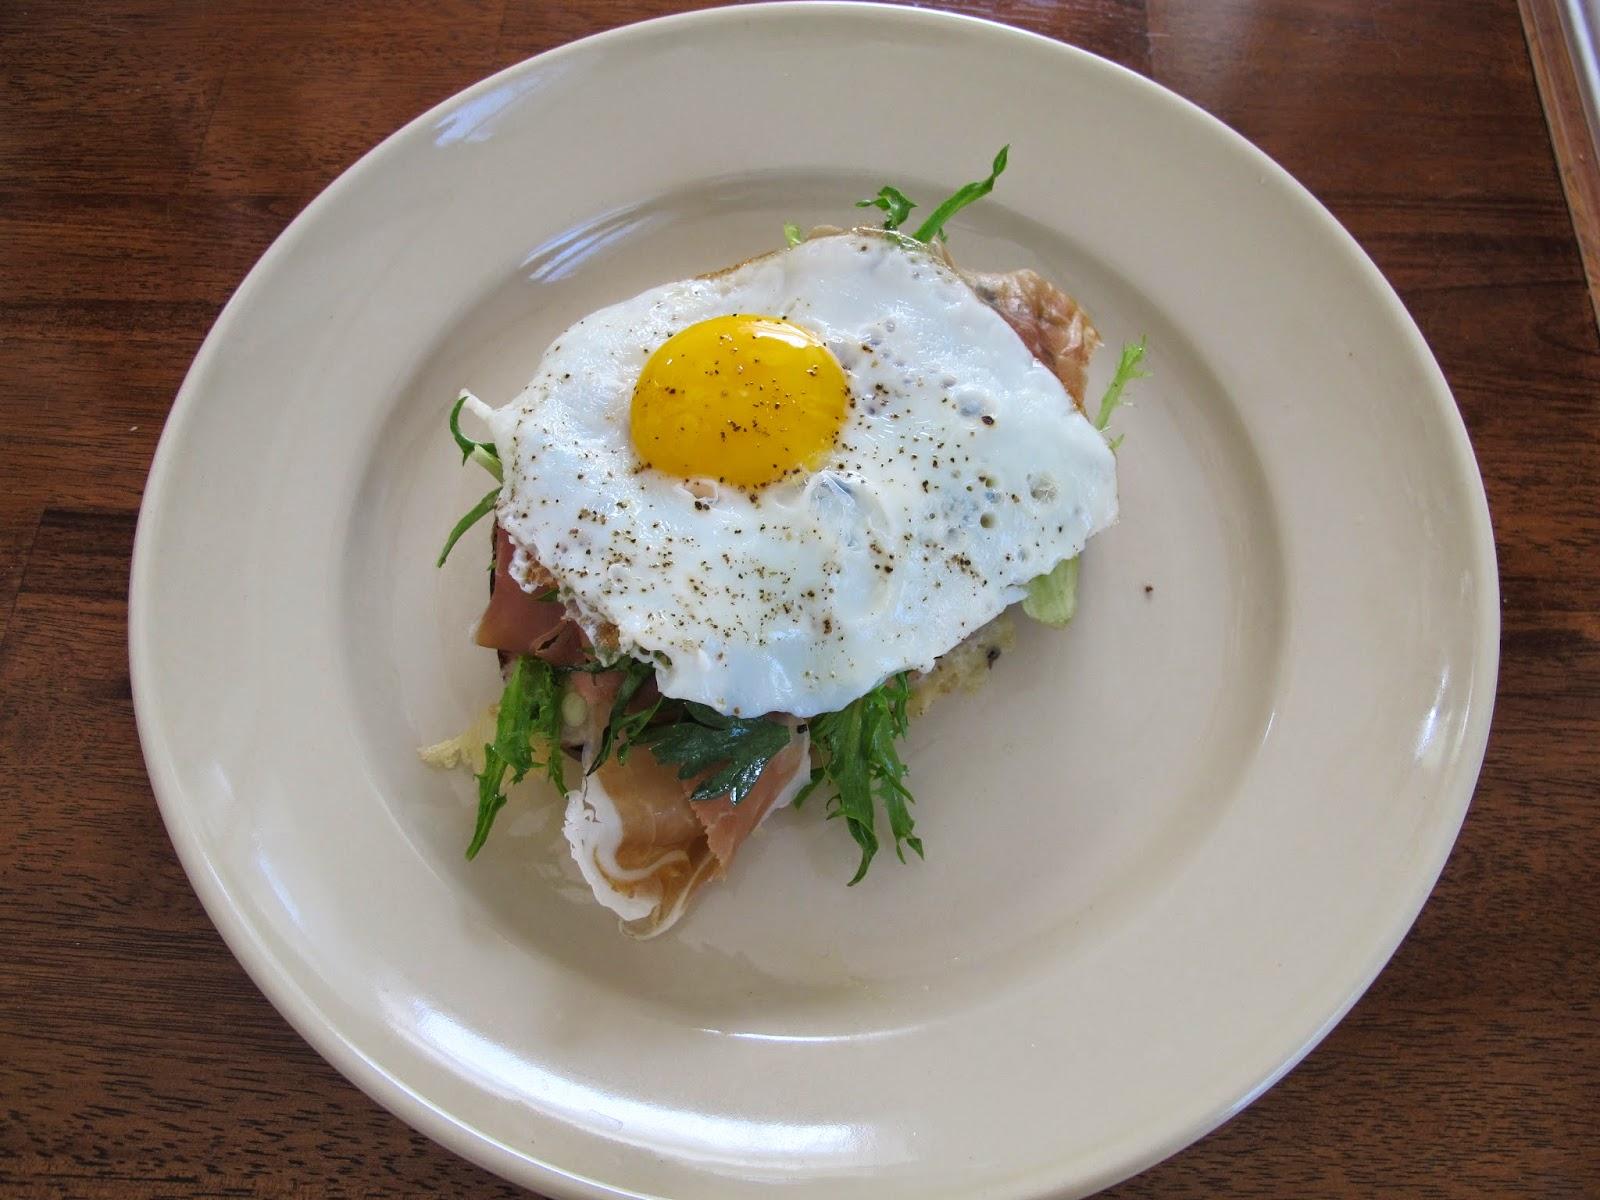 Brioche with Gruyere, Prosciutto, Frisee, and Fried Egg